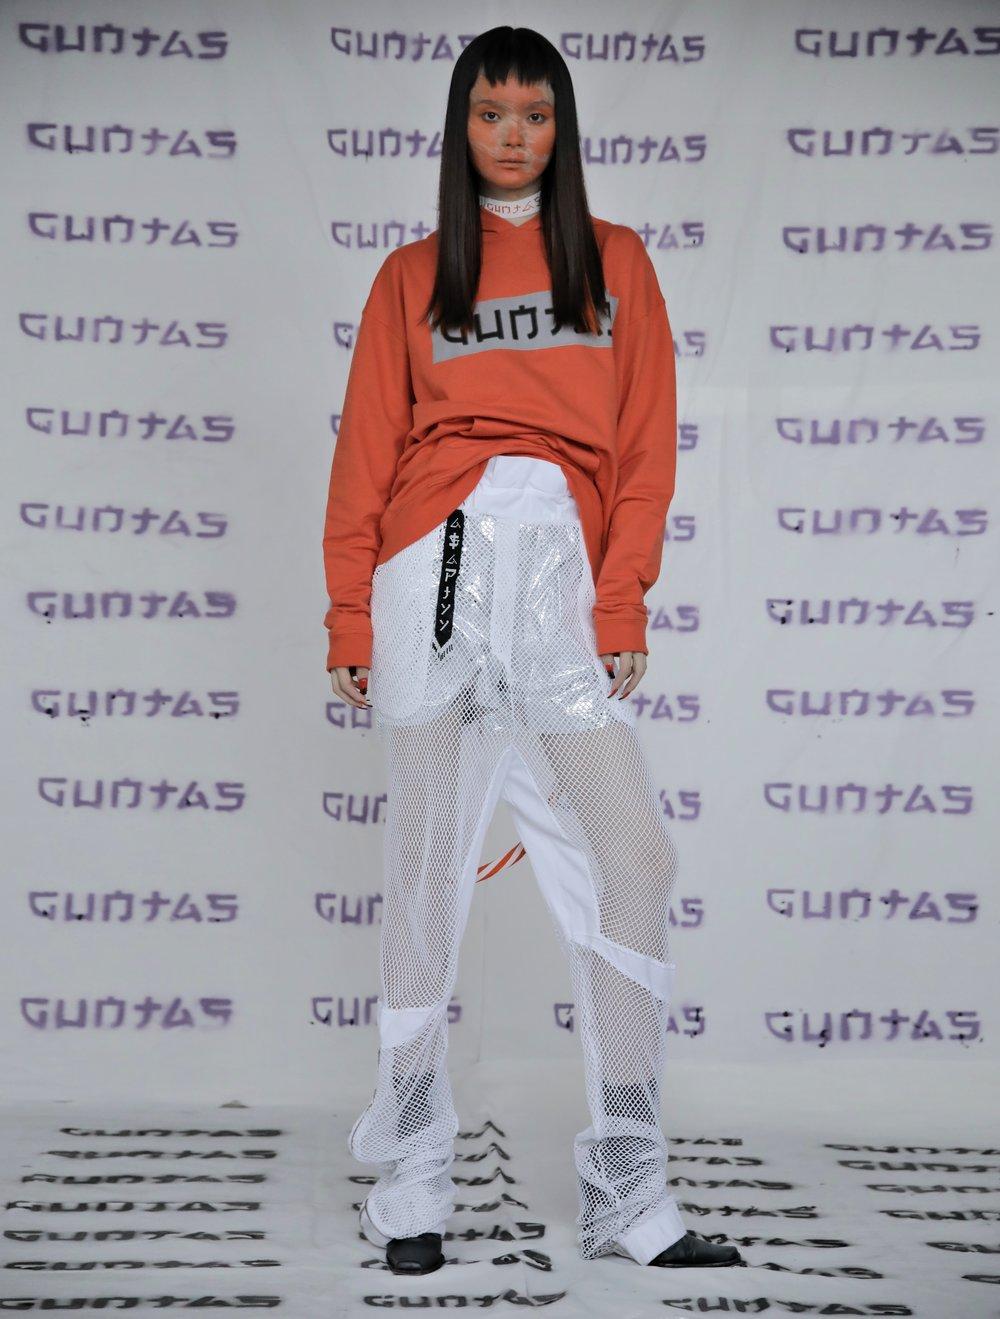 GUNTAS — SS18 Lookbook 7.jpg